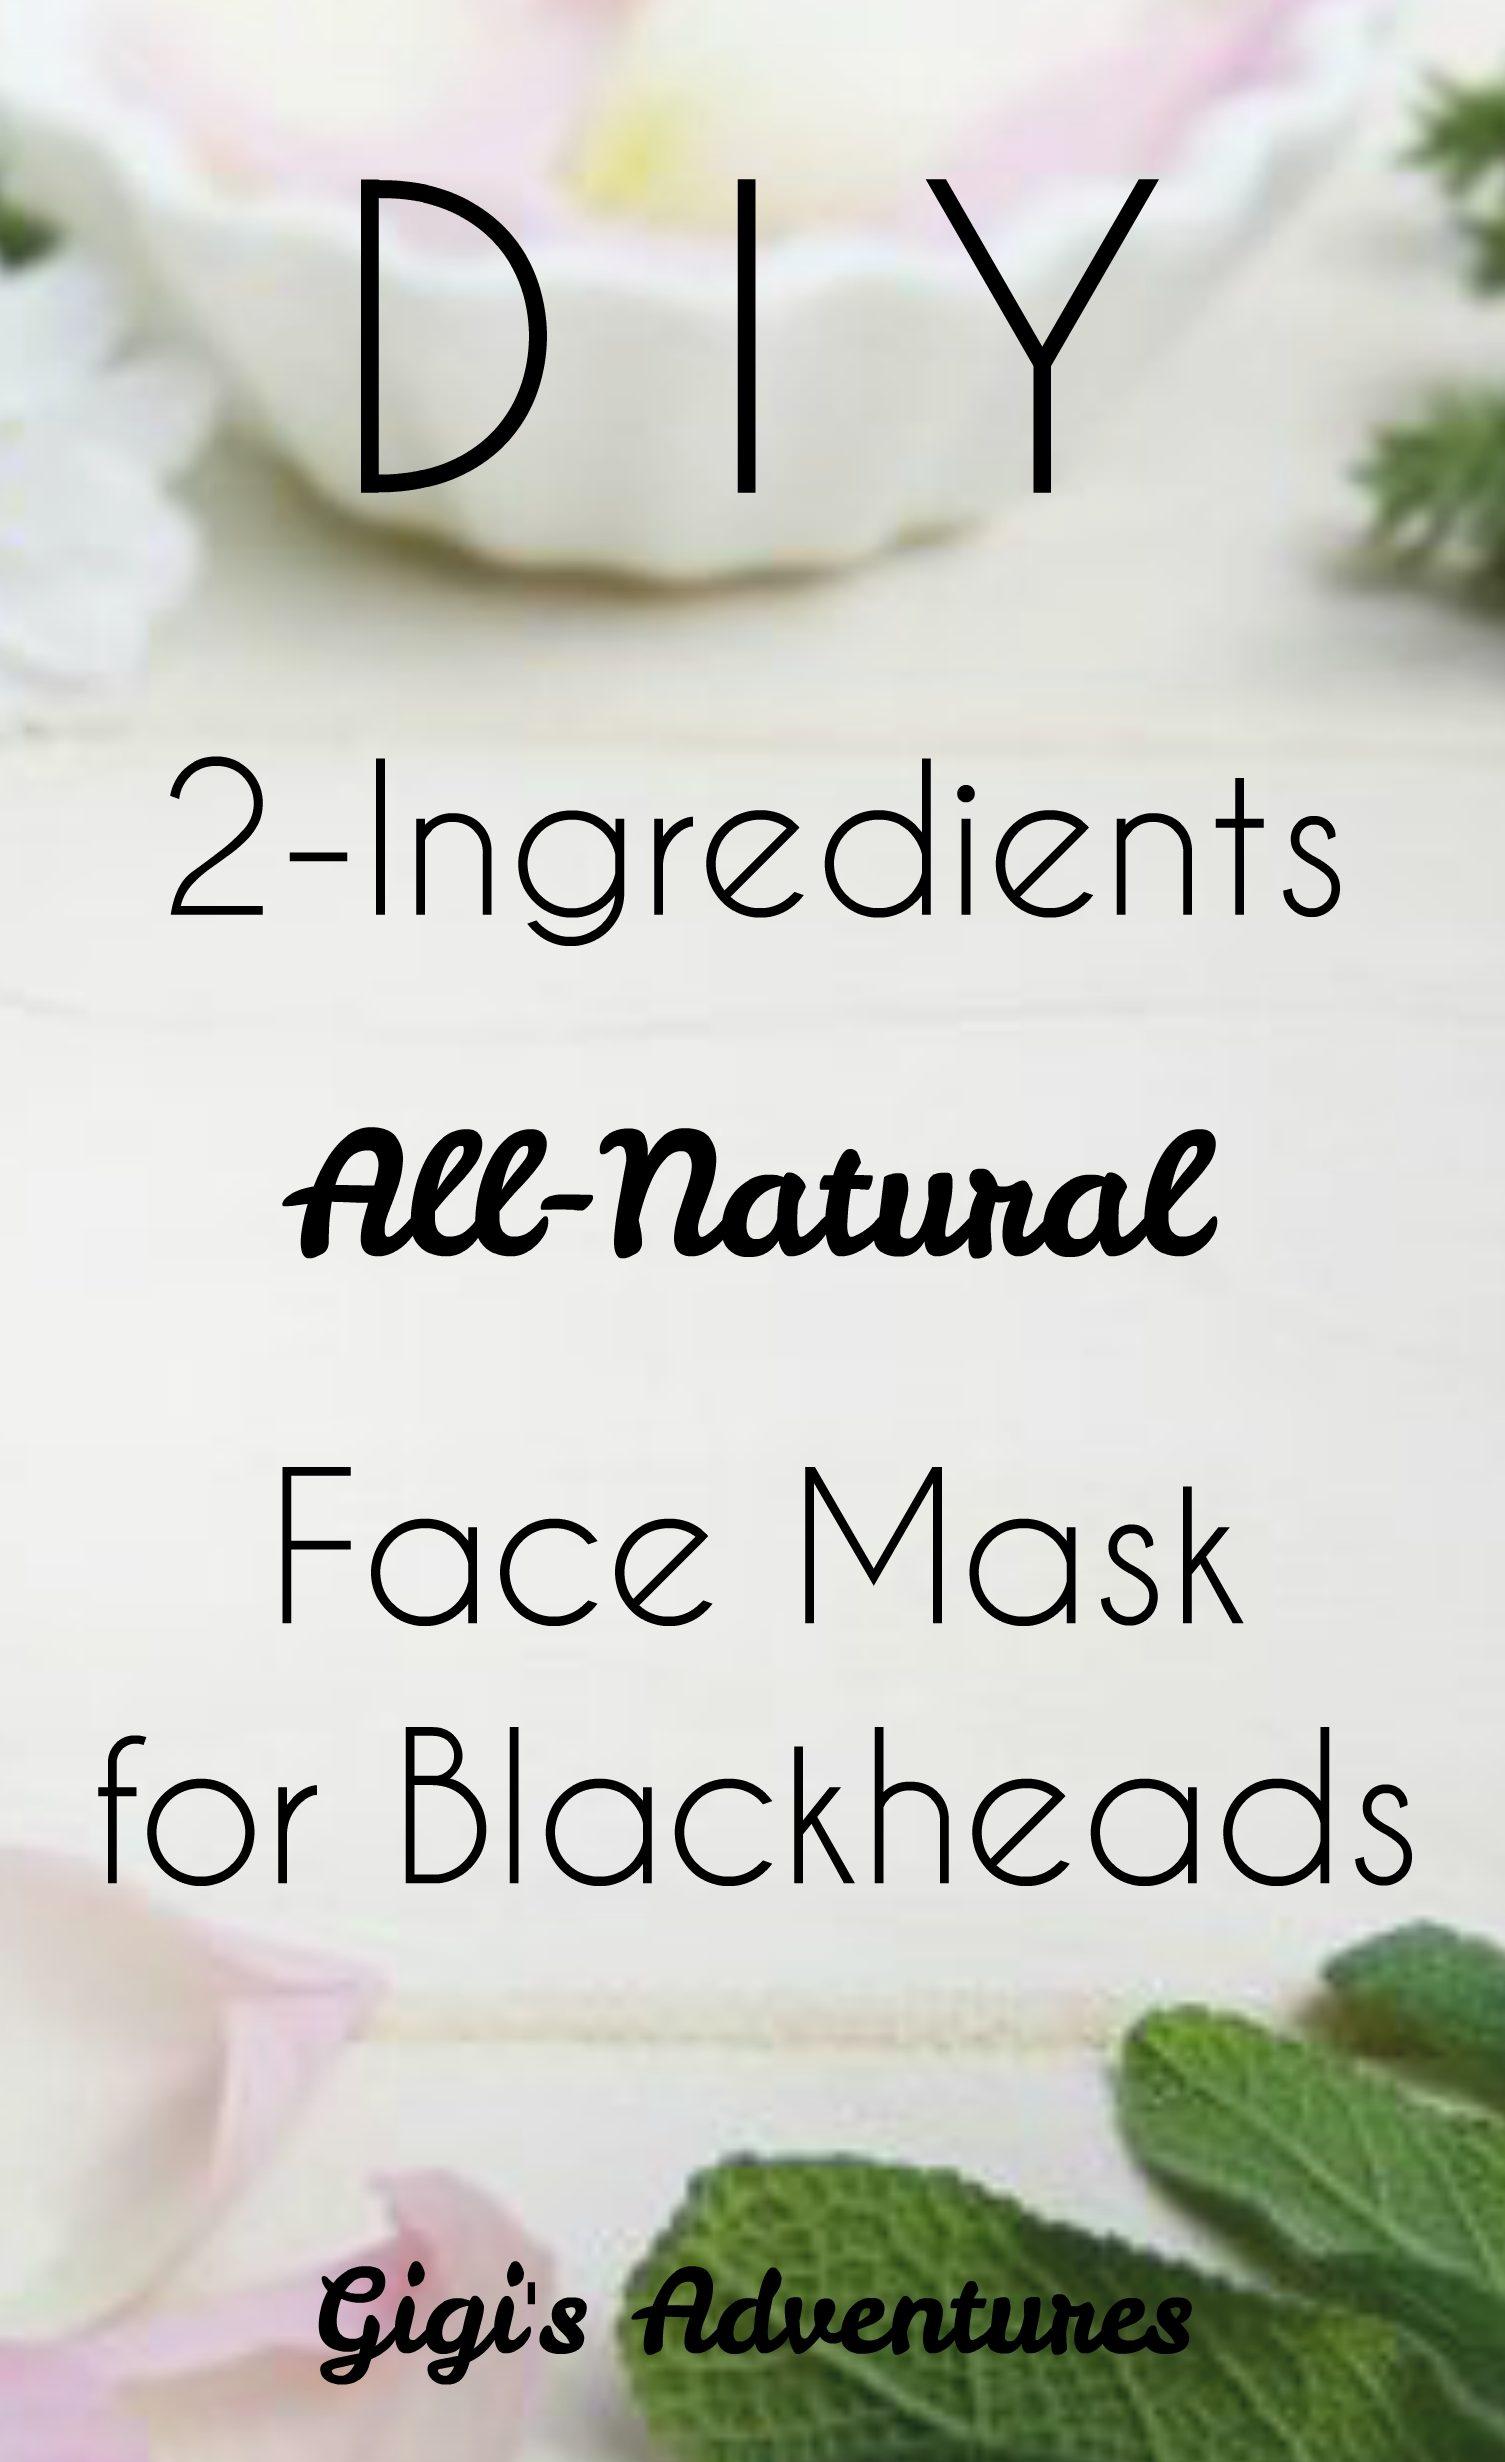 Diy 2 Ingredients All Natural Face Mask For Blackheads Gigi